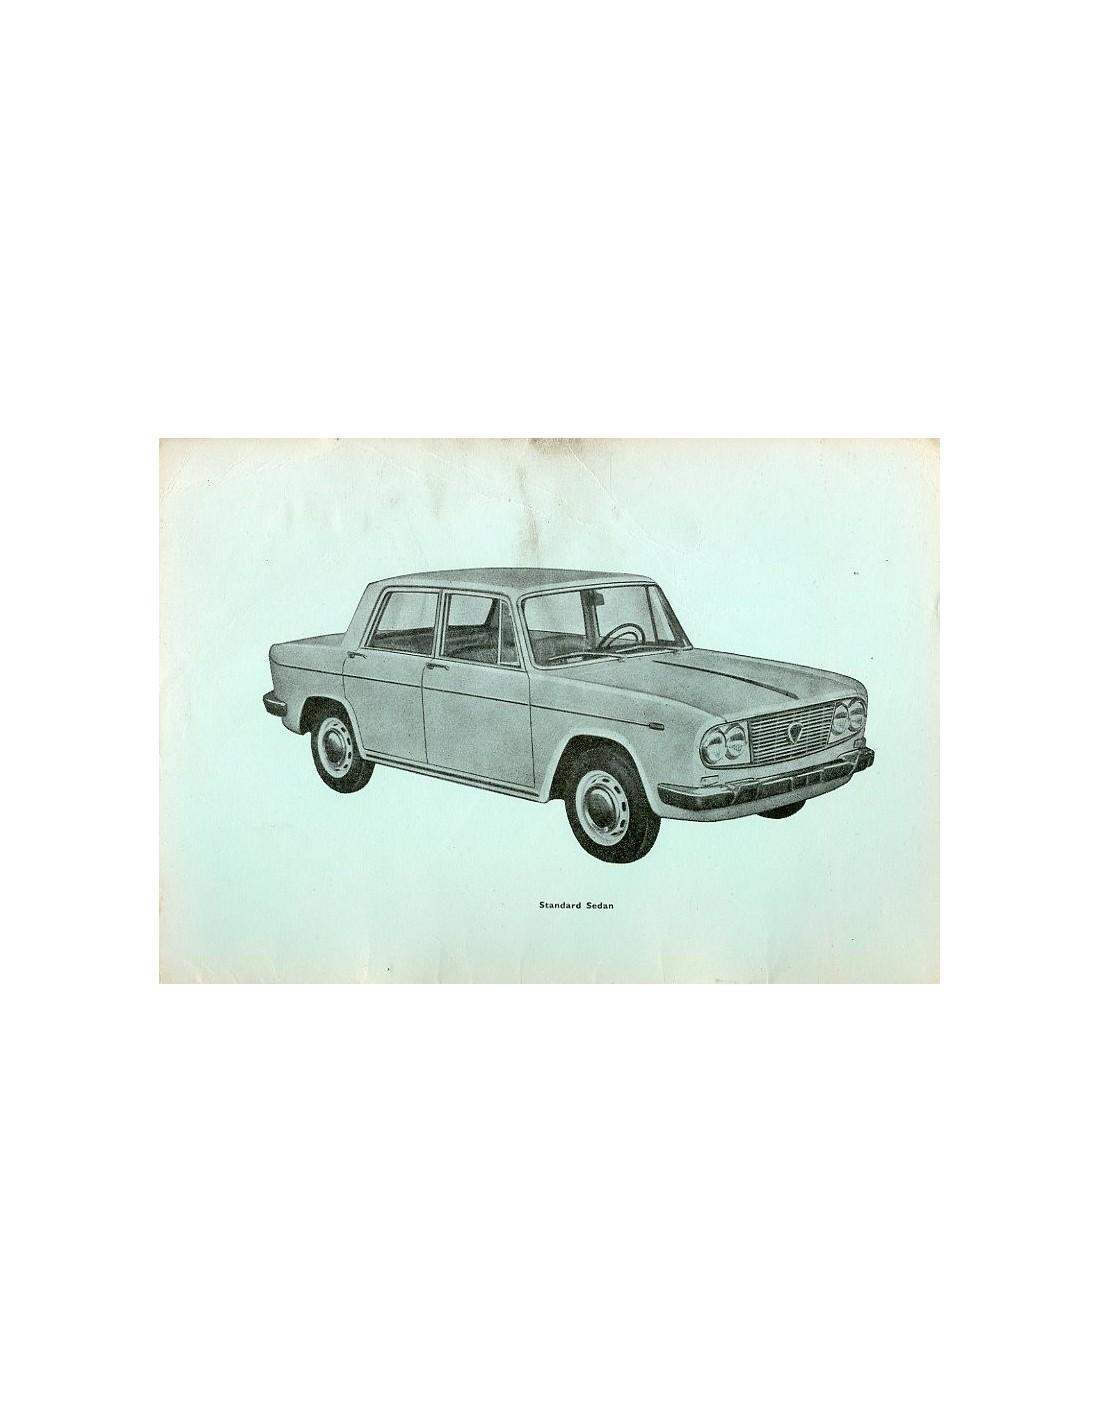 1963 lancia fulvia berlina owners manual handbook english rh autolit eu Lancia Zagato Lancia Zagato